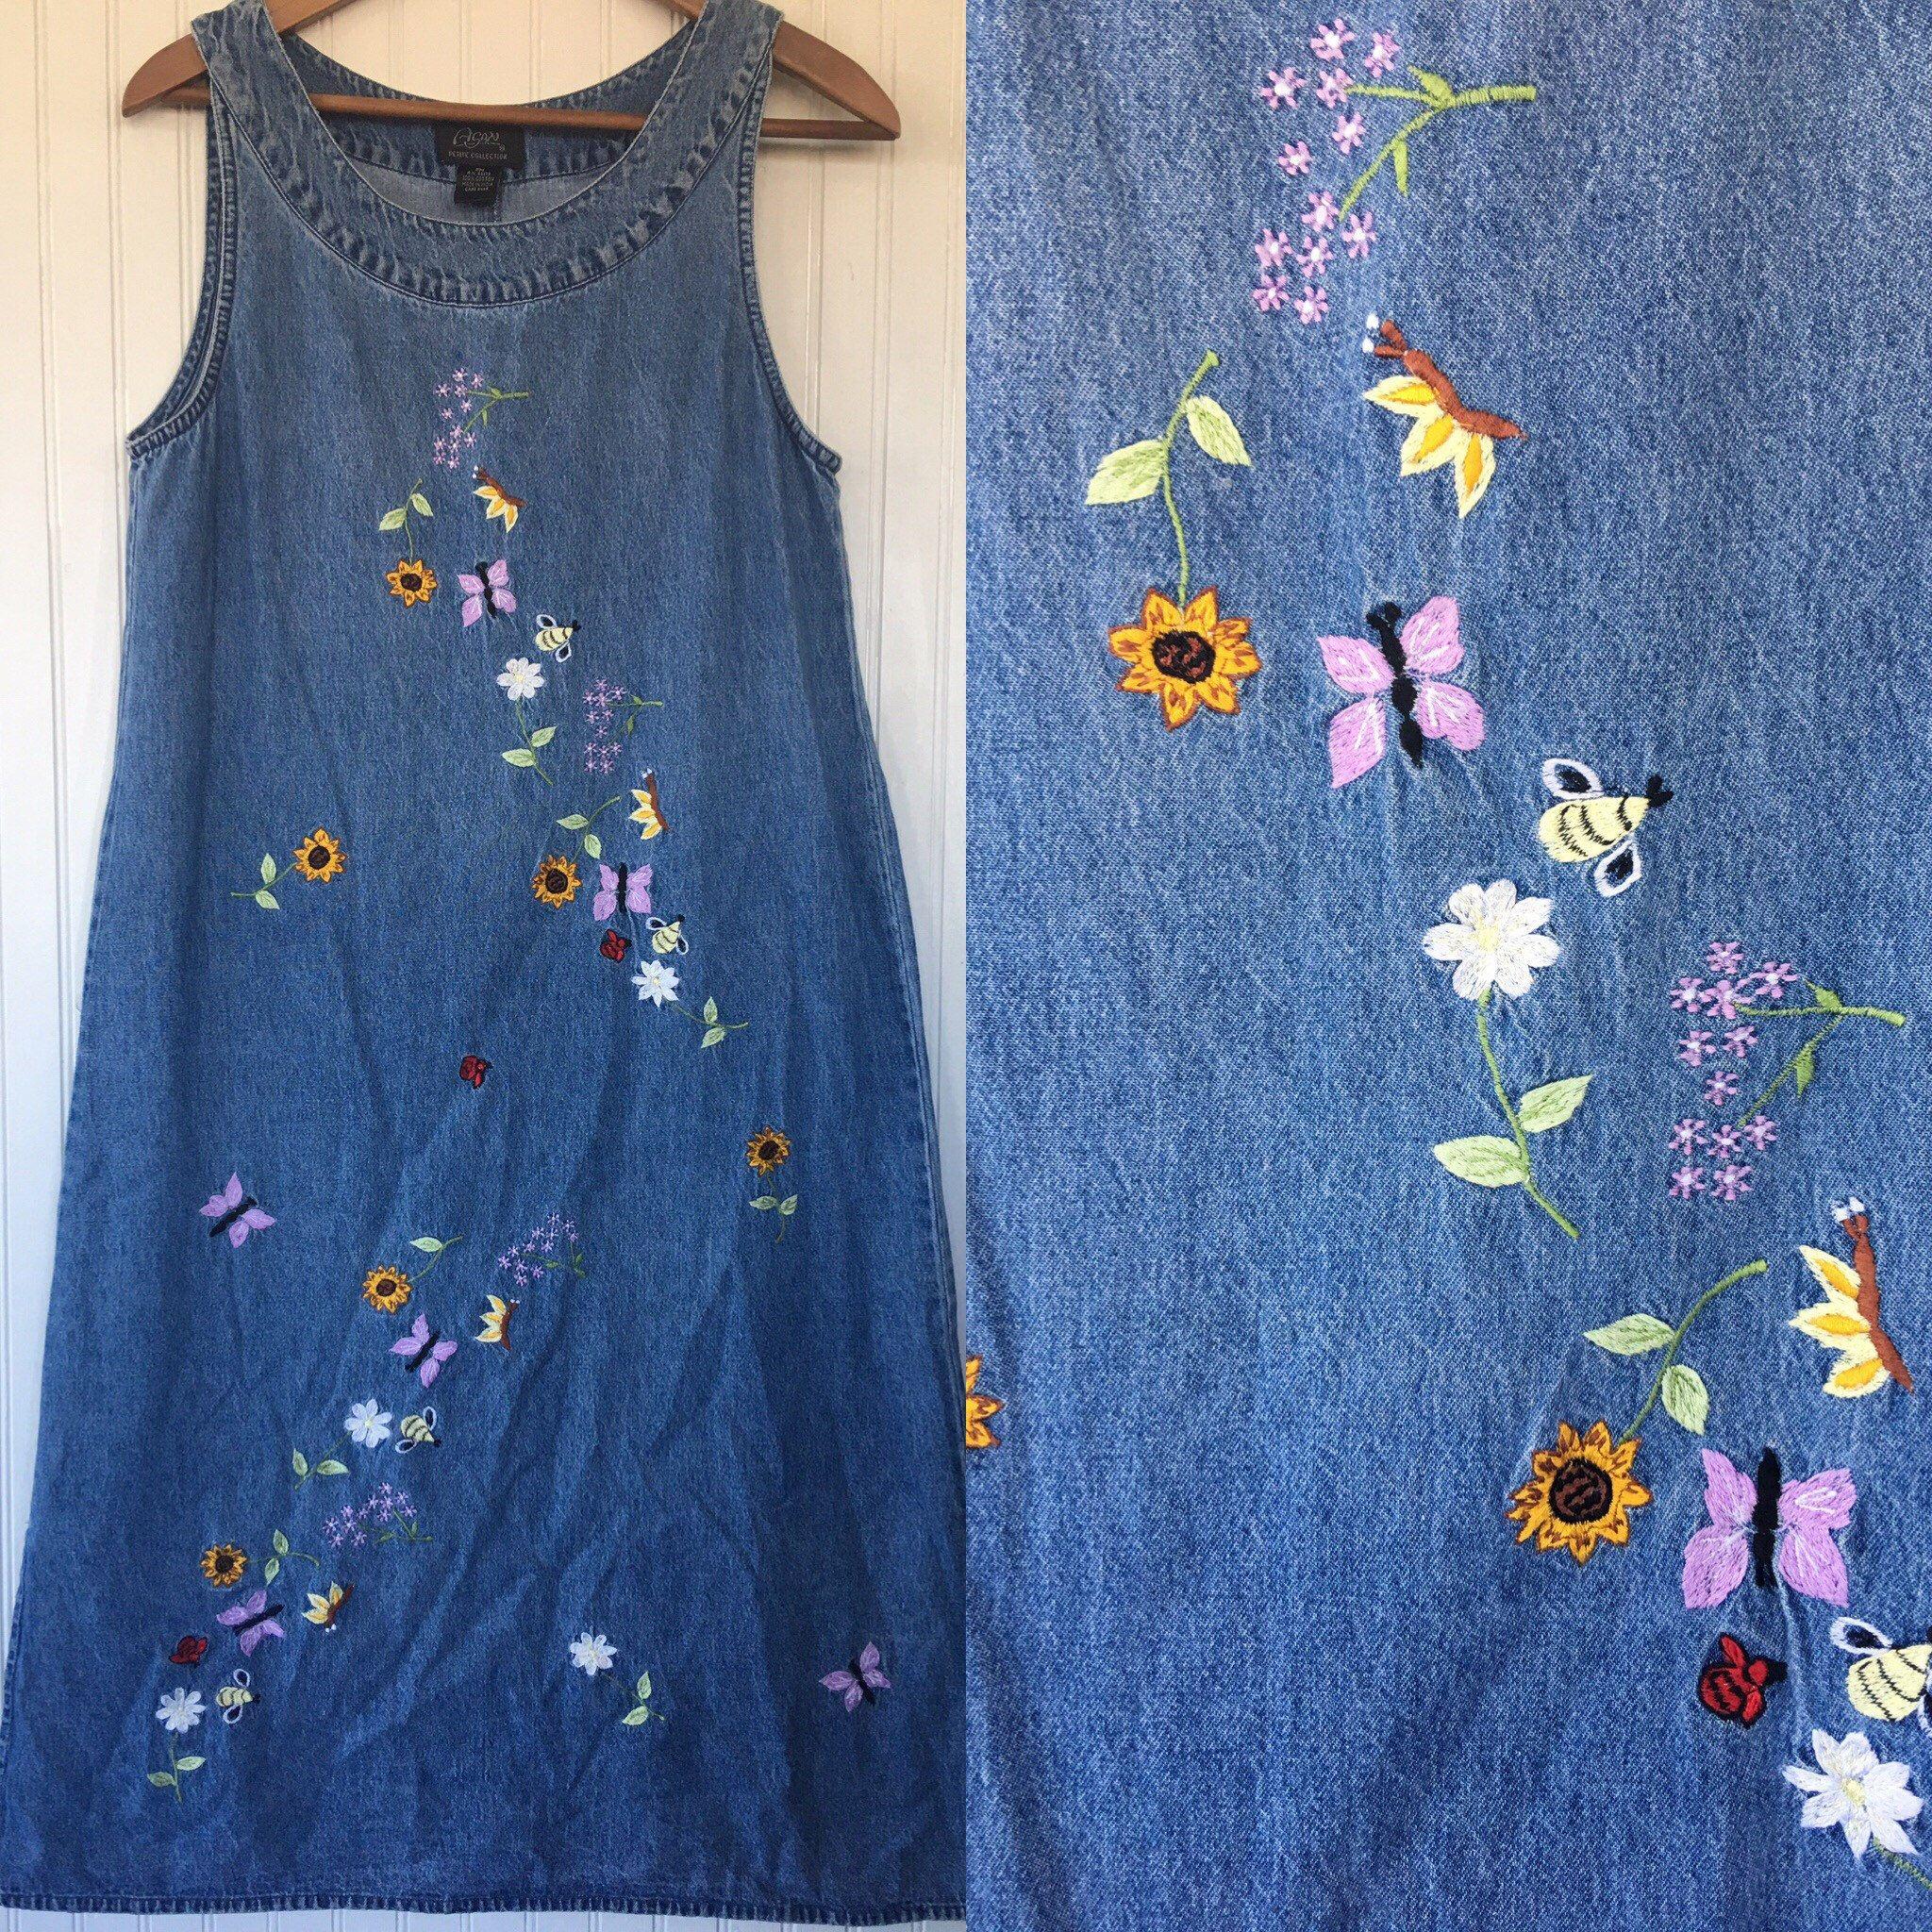 a94e770c66d24 Vintage 90s Denim Jumper Blue Jean Sleeveless Dress Size PM Small Petite  Medium M Med S